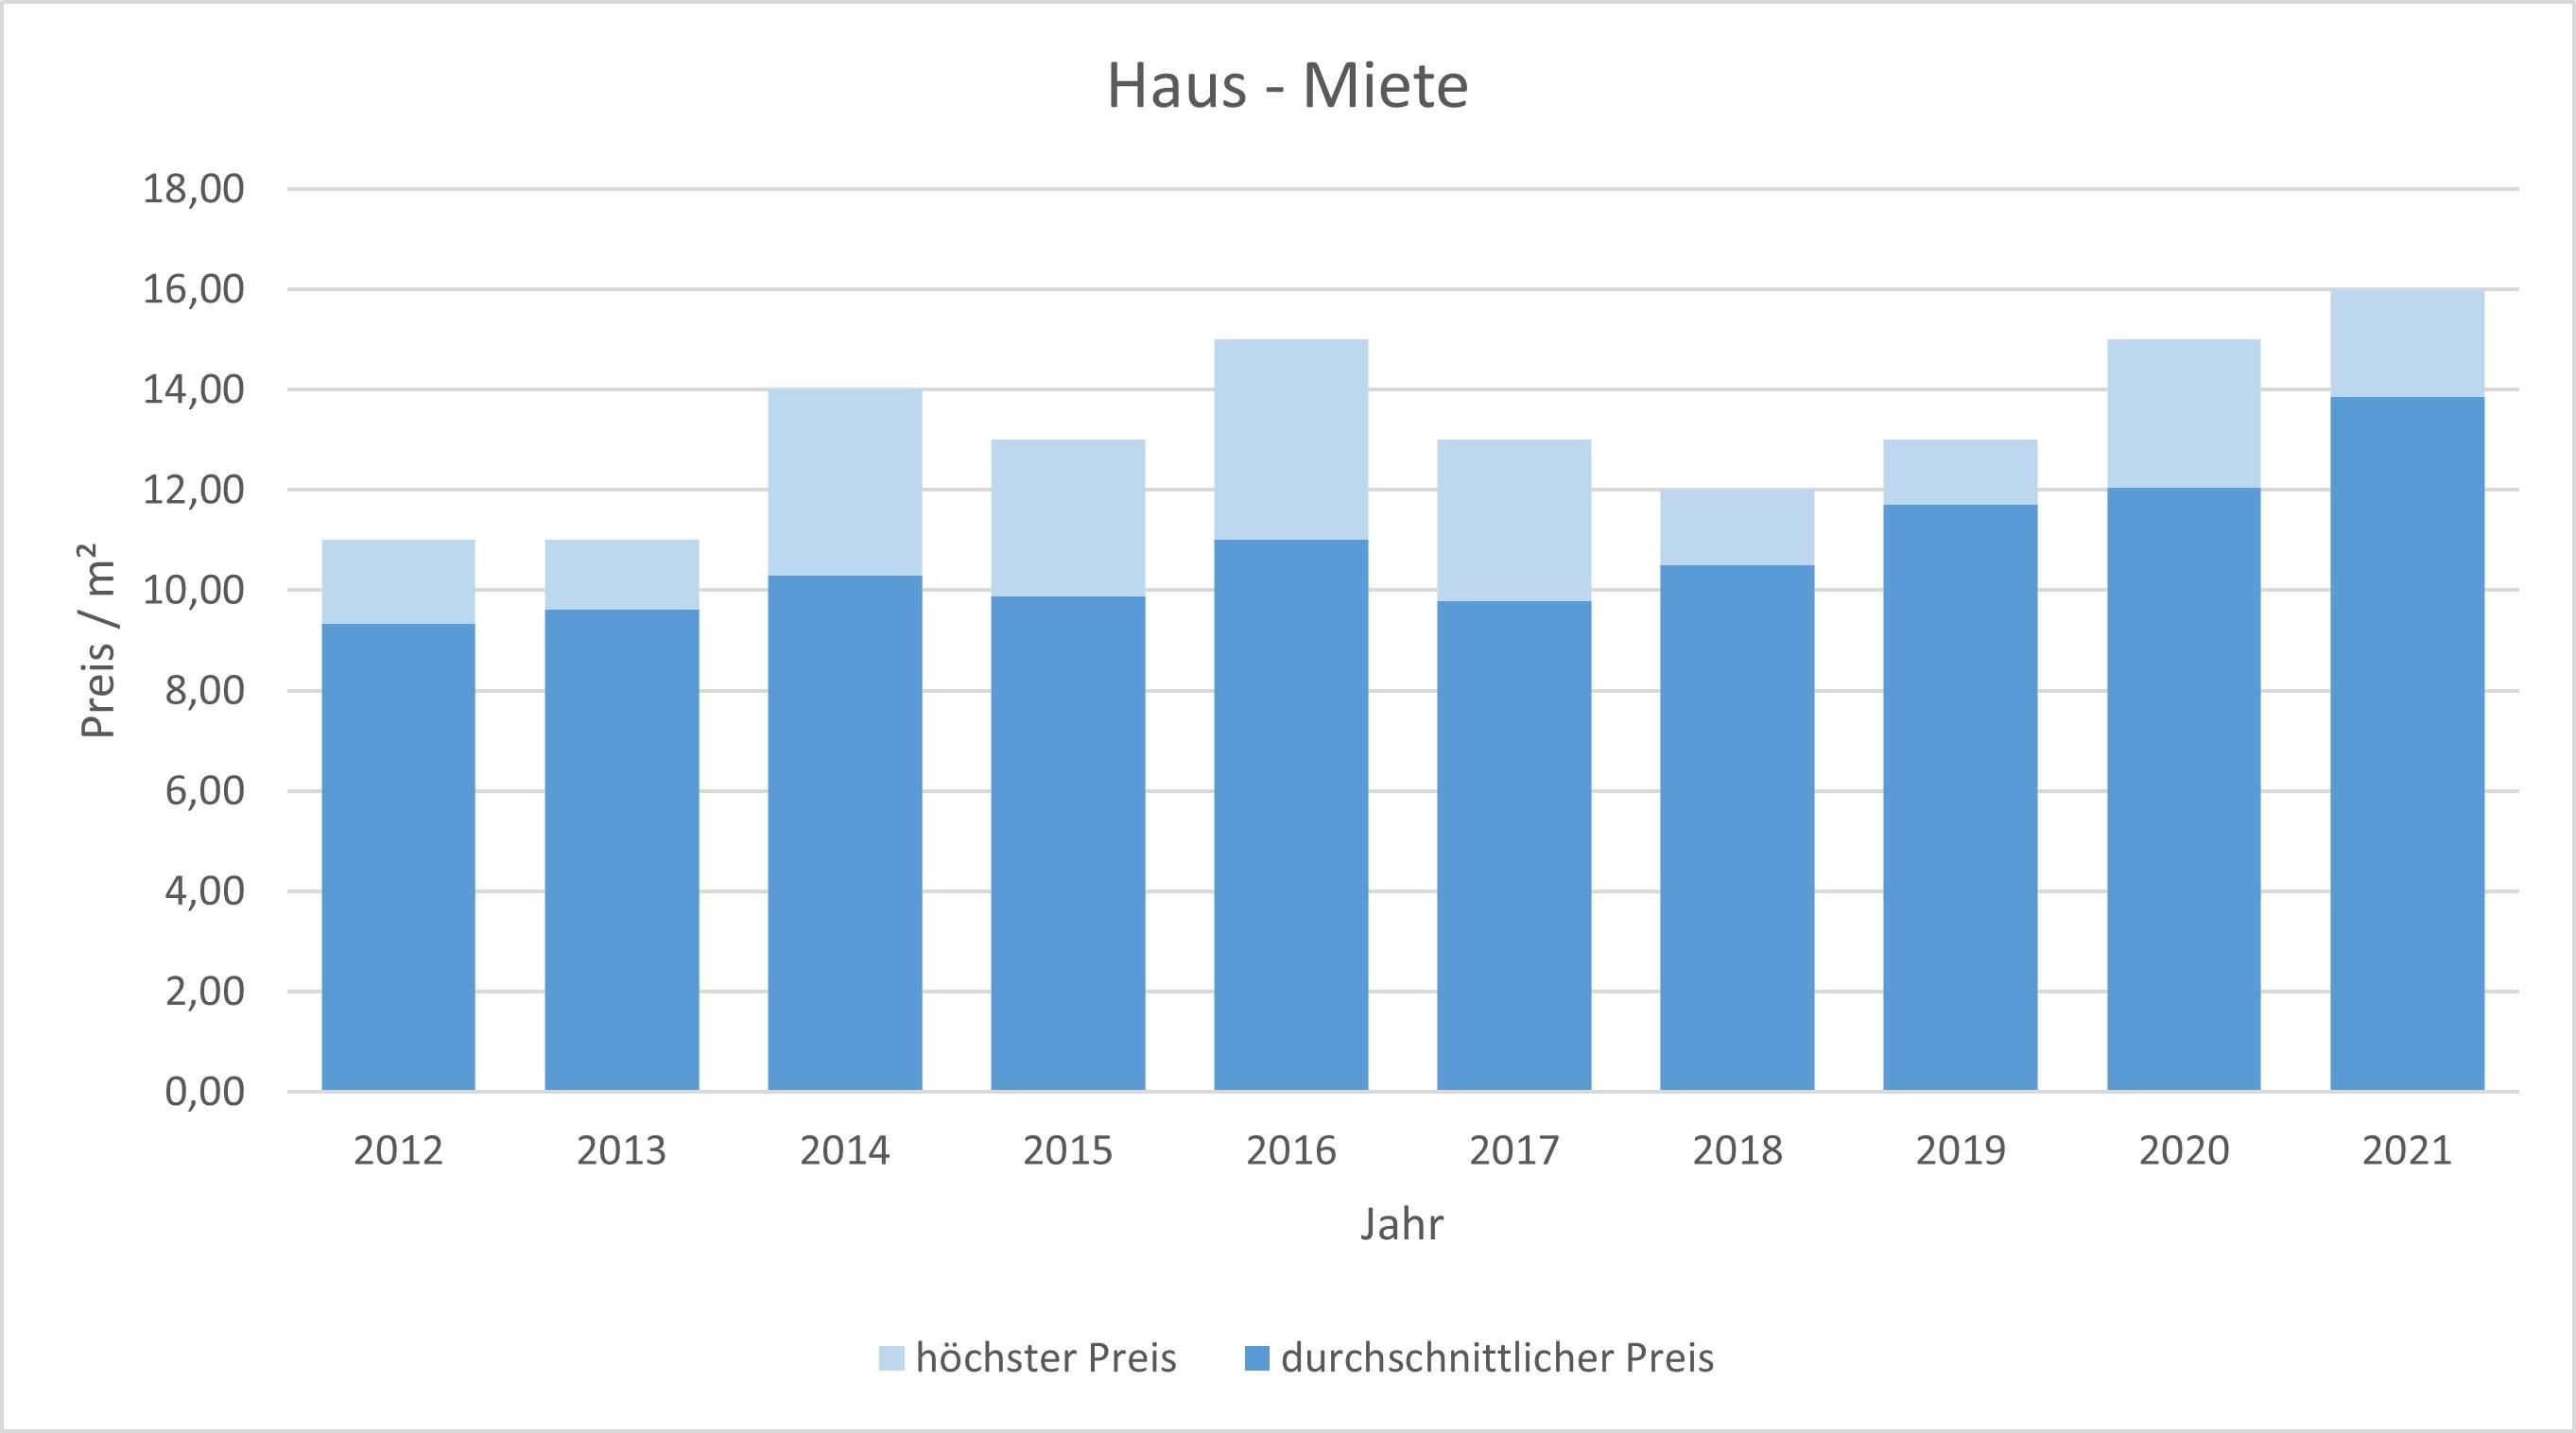 Egling Haus mieten vermieten Preis Bewertung Makler www.happy-immo.de 2019 2020 2021